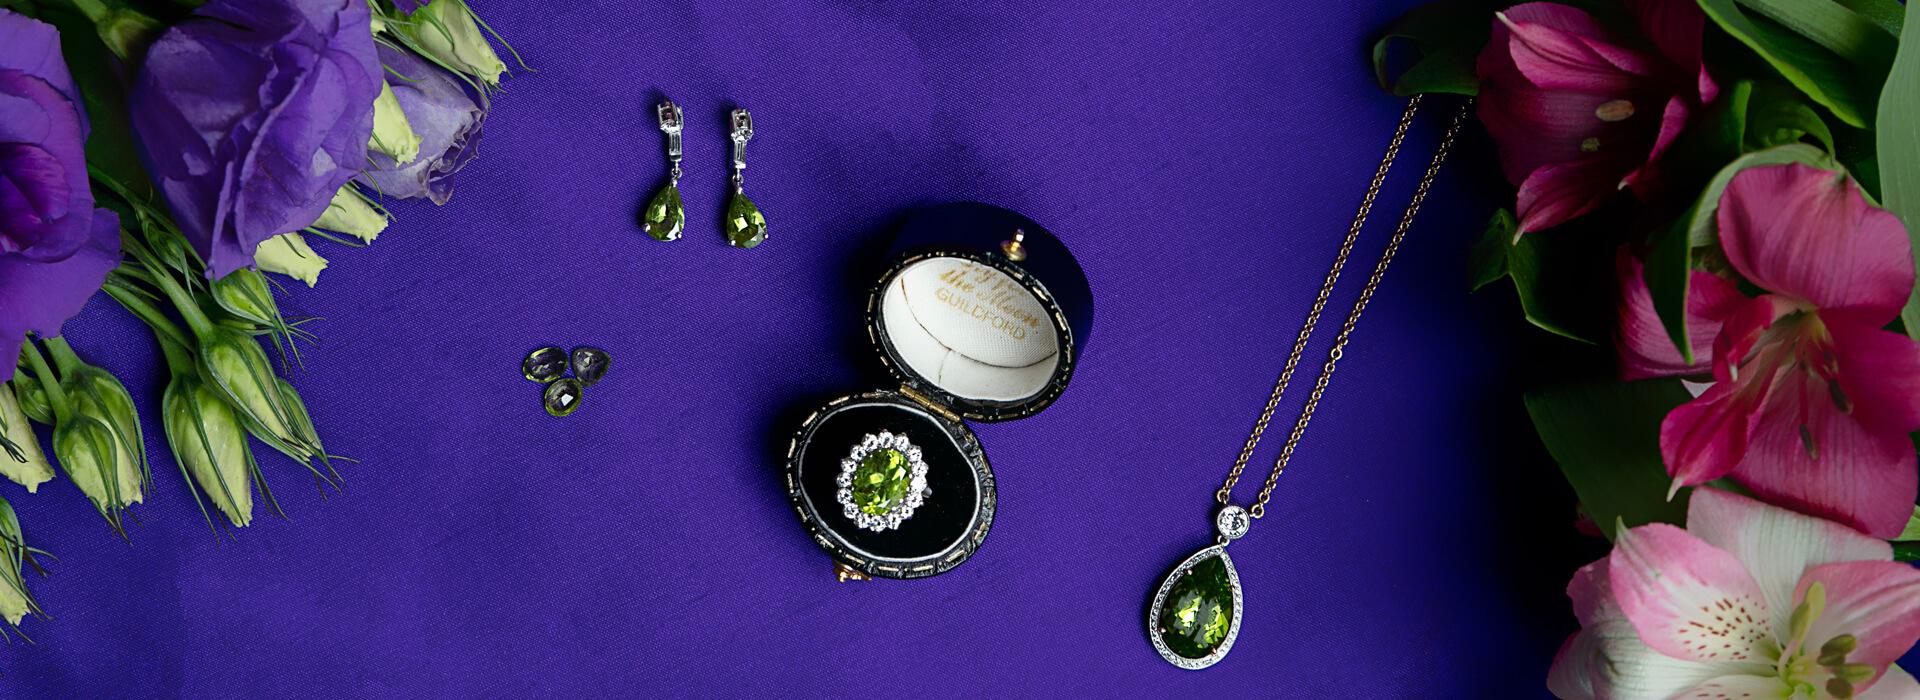 jewellery-peridot